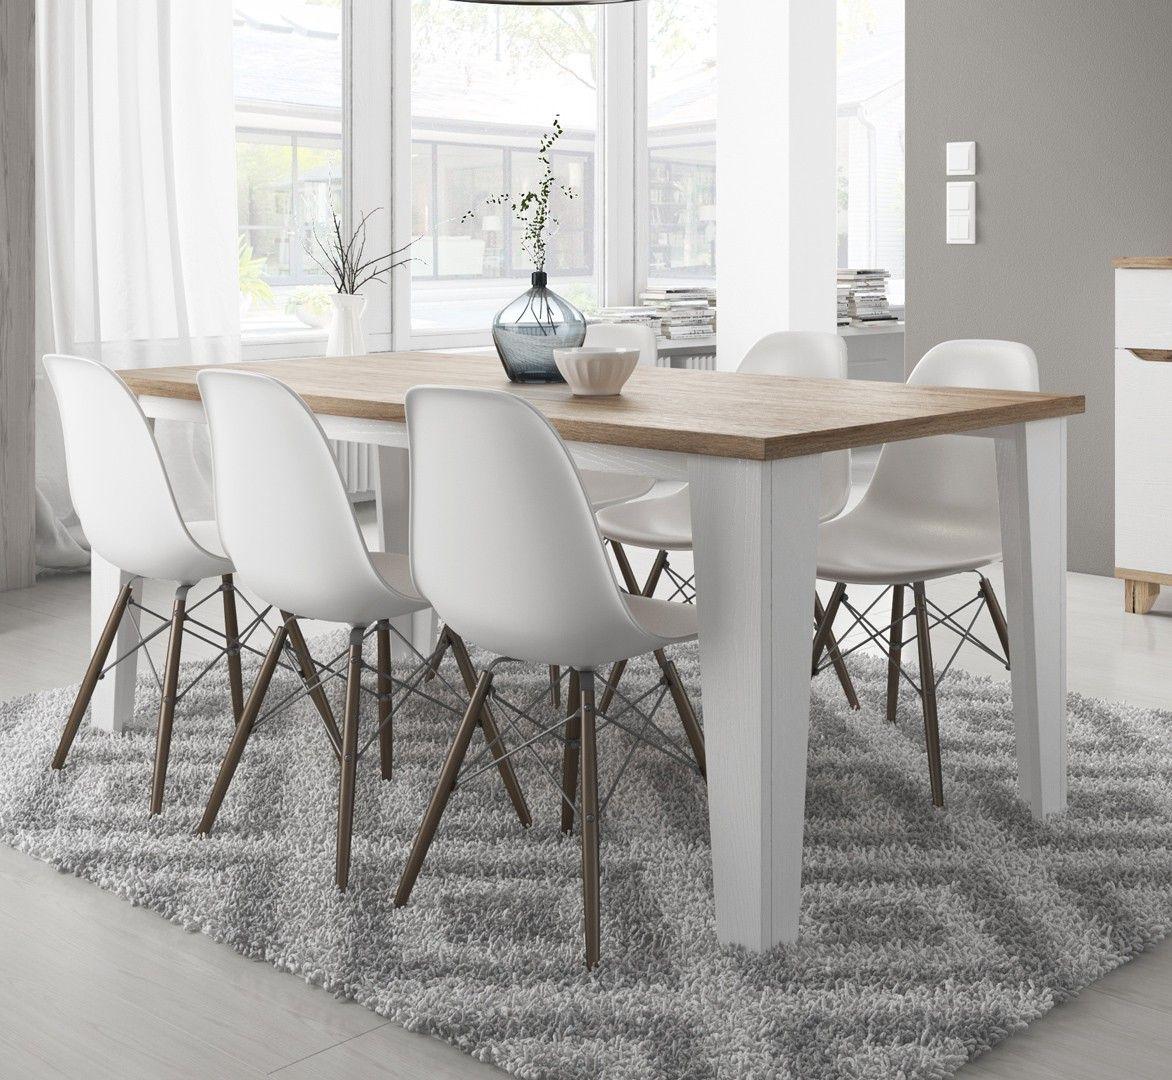 table avec meubles salle a manger ikea